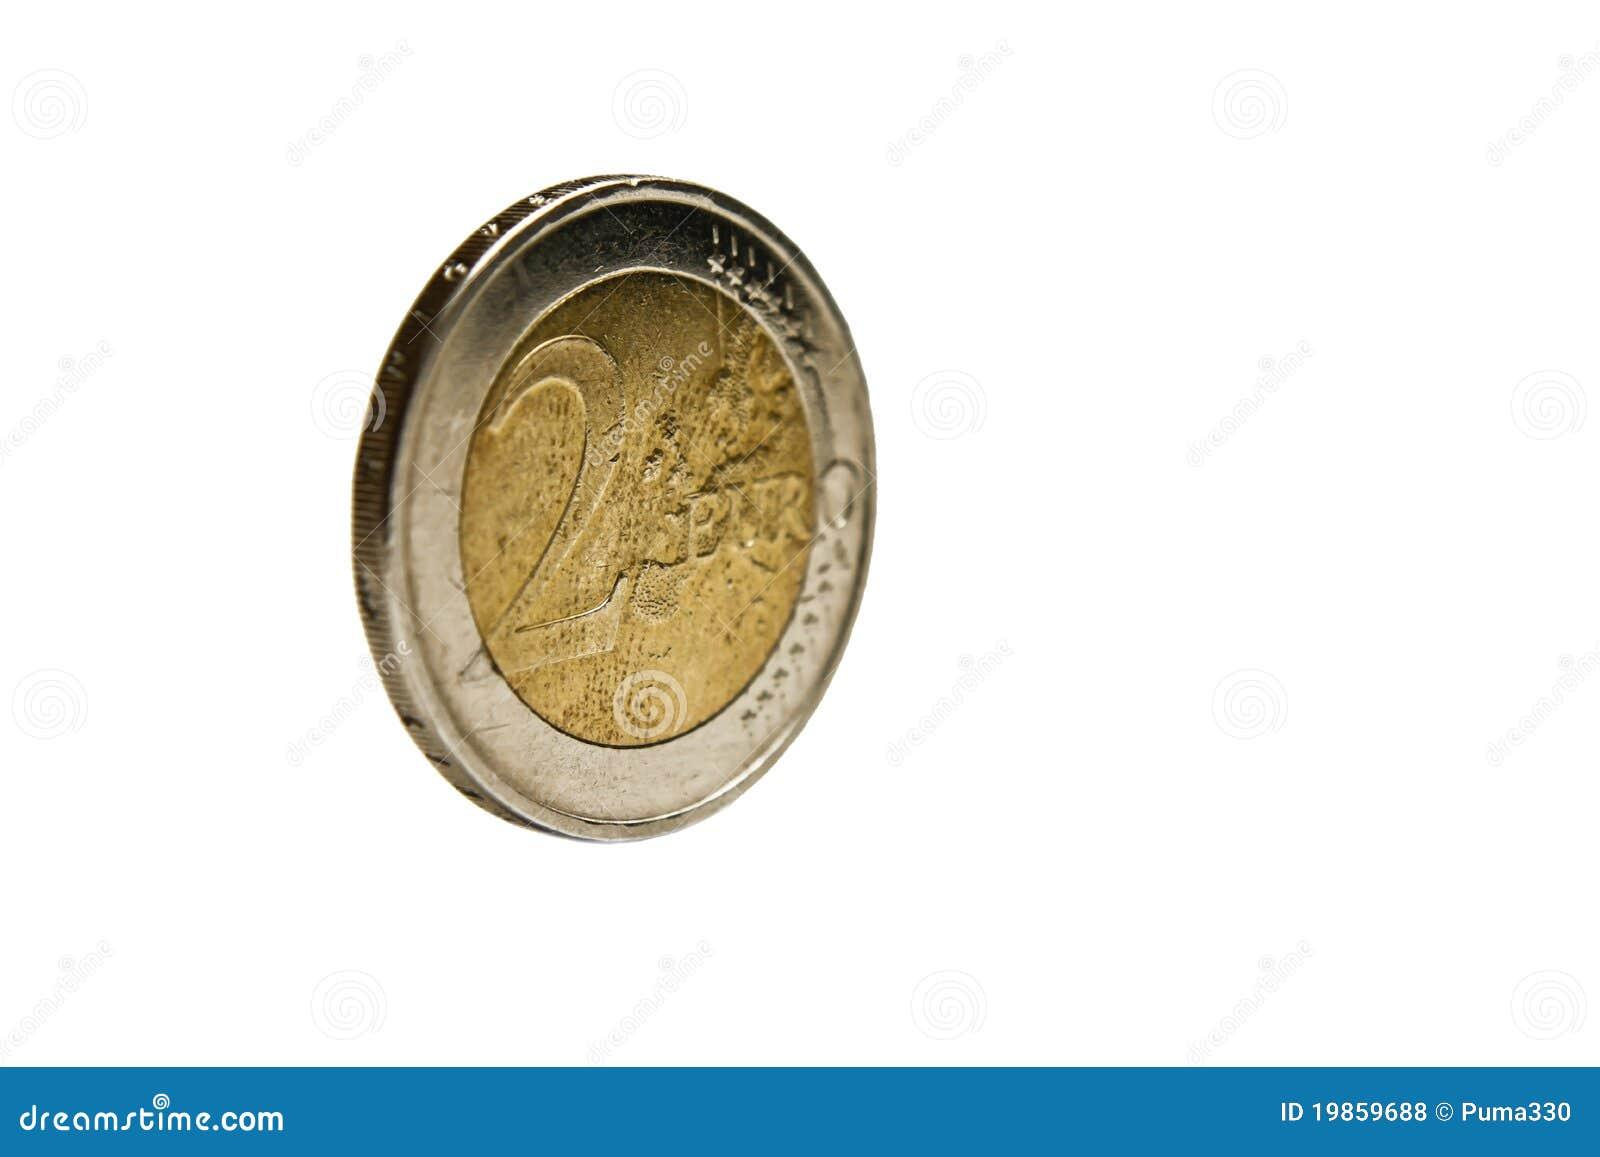 Euro coin gallery / Star coin codes november 2018 january